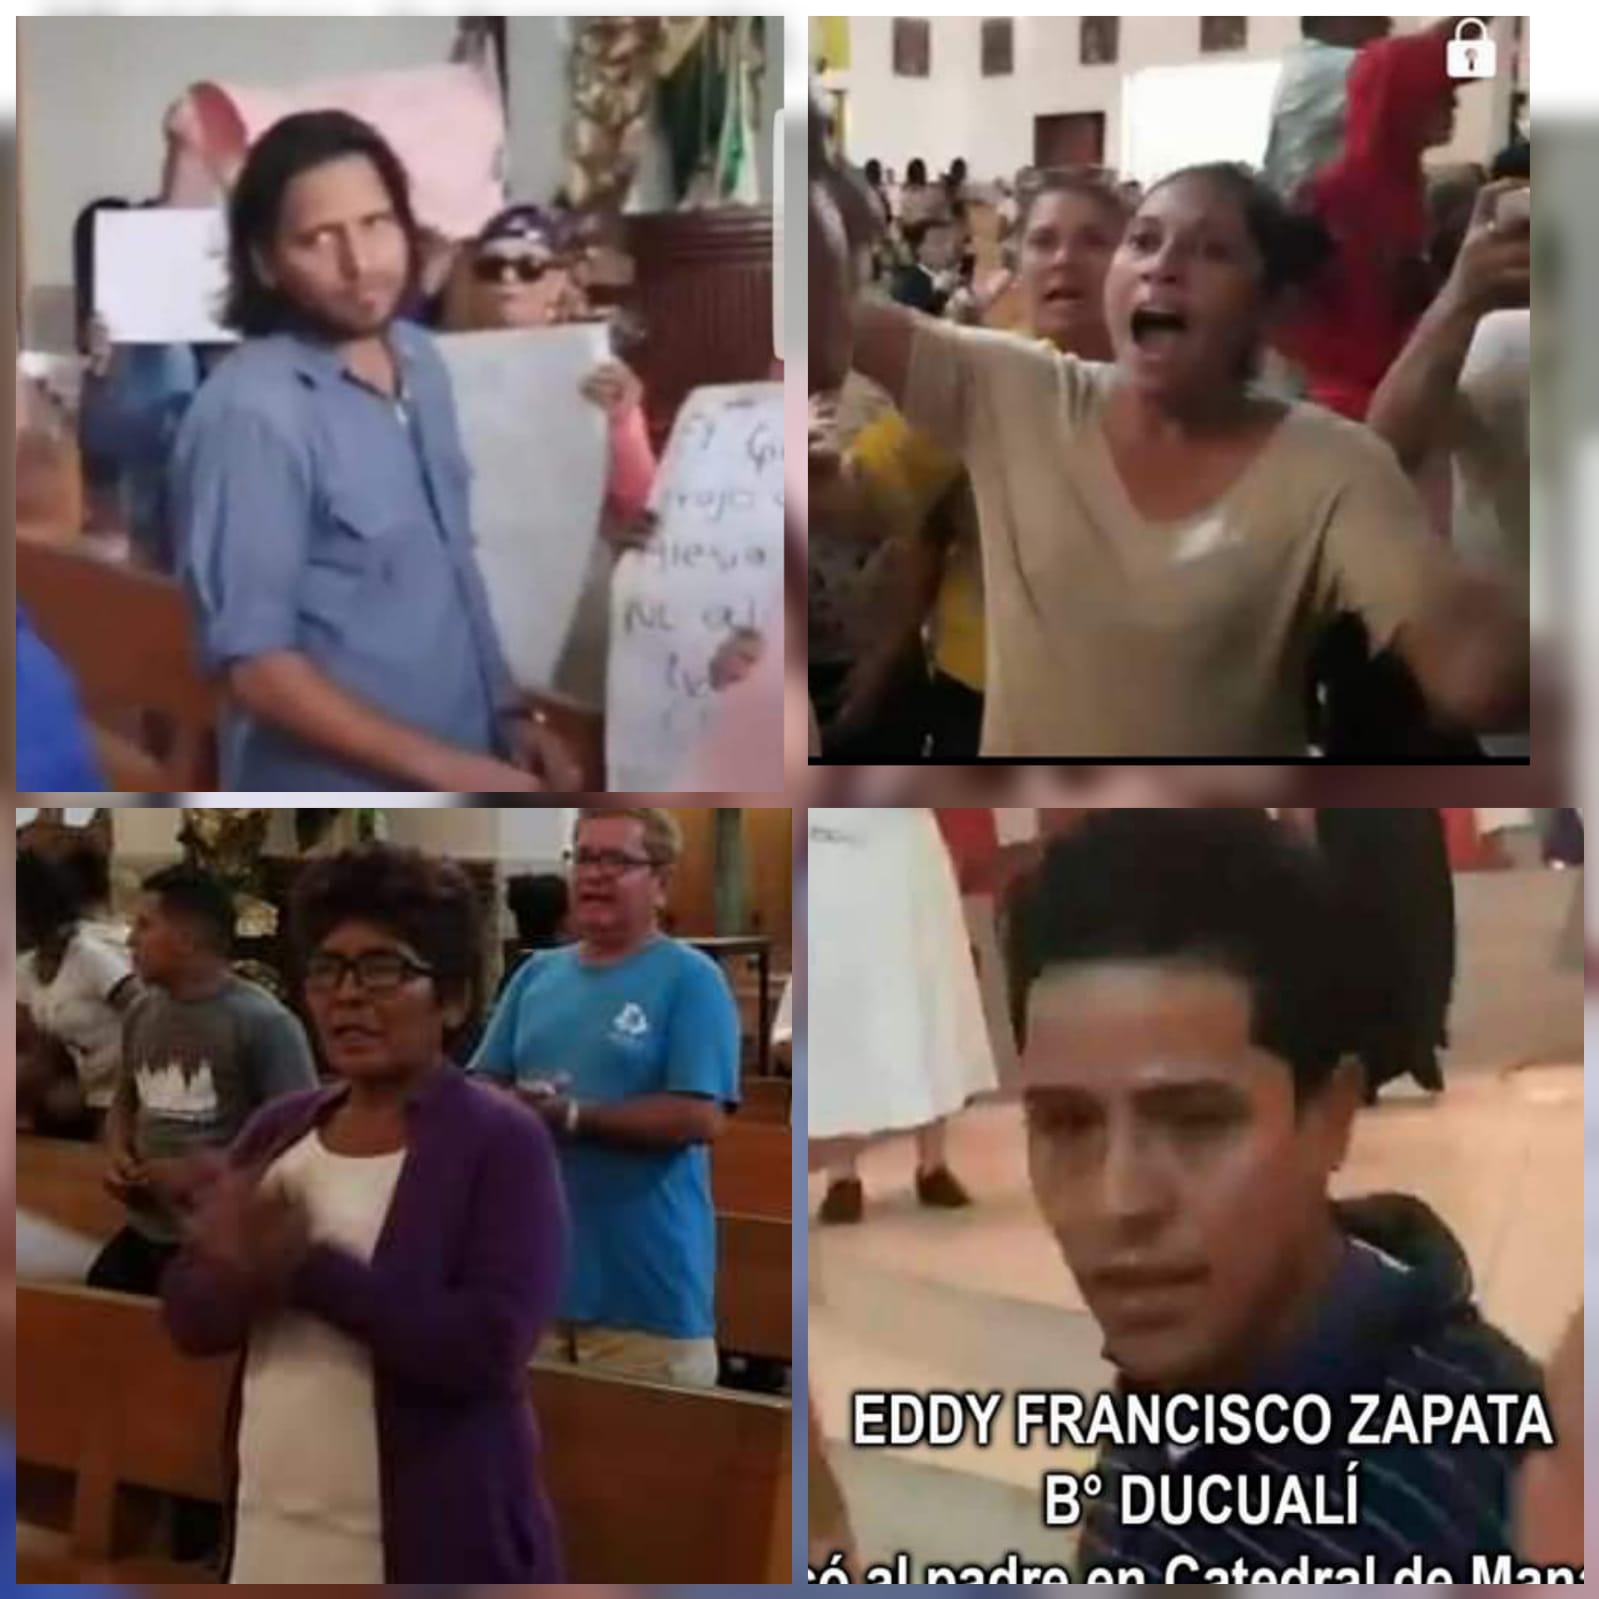 Usuarios de Facebook identifican a turberos que agredieron a sacerdote en Catedral de Managua